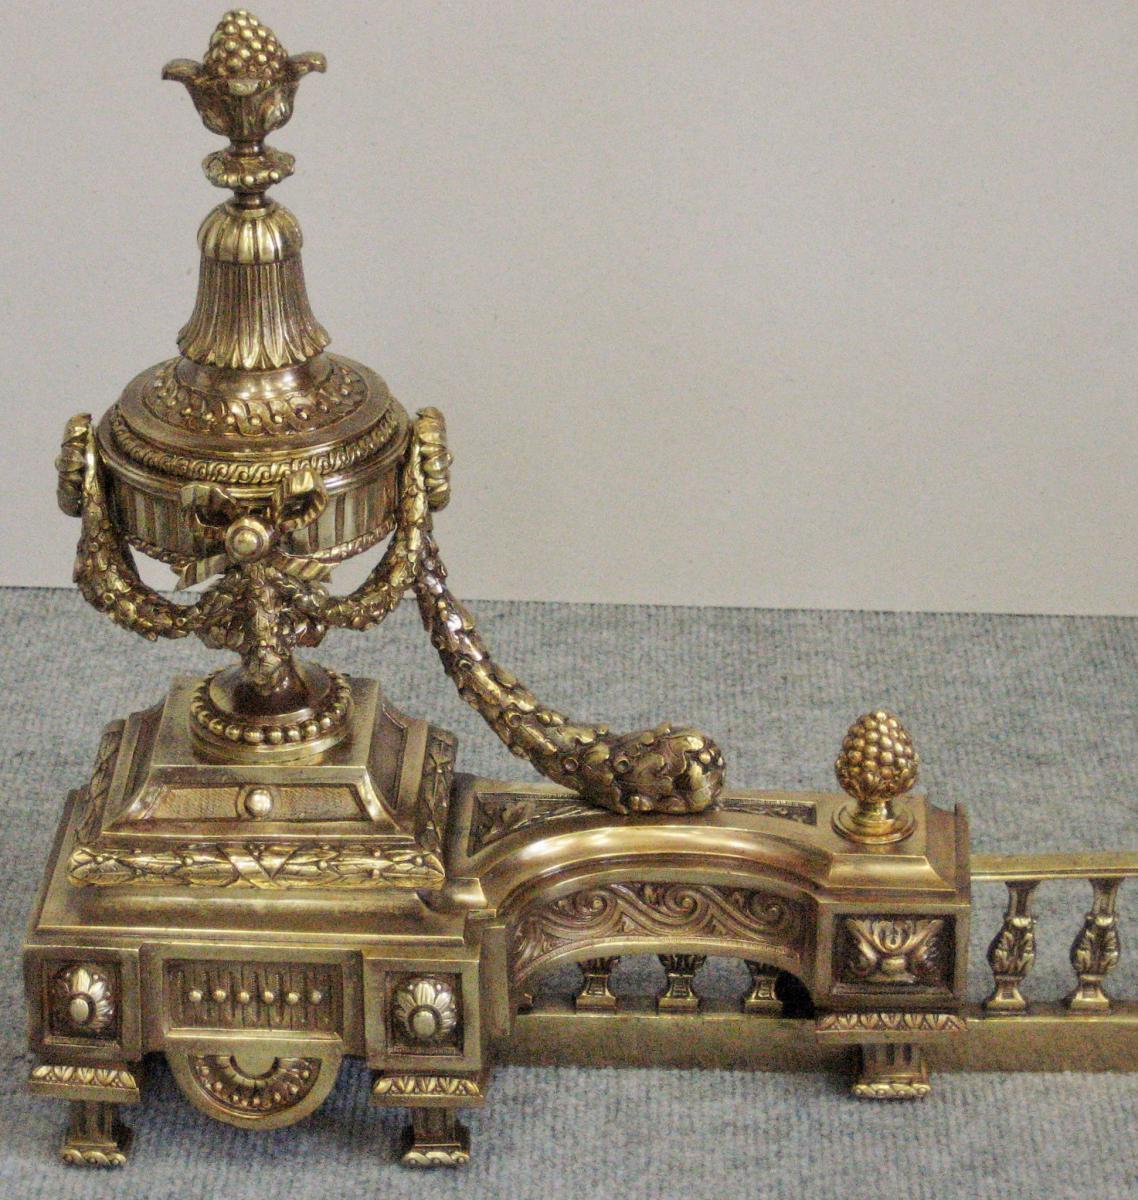 Chen ts en bronze patin style louis xvi poque 19eme chenets accessoires de chemin e - Chenets de cheminee ...